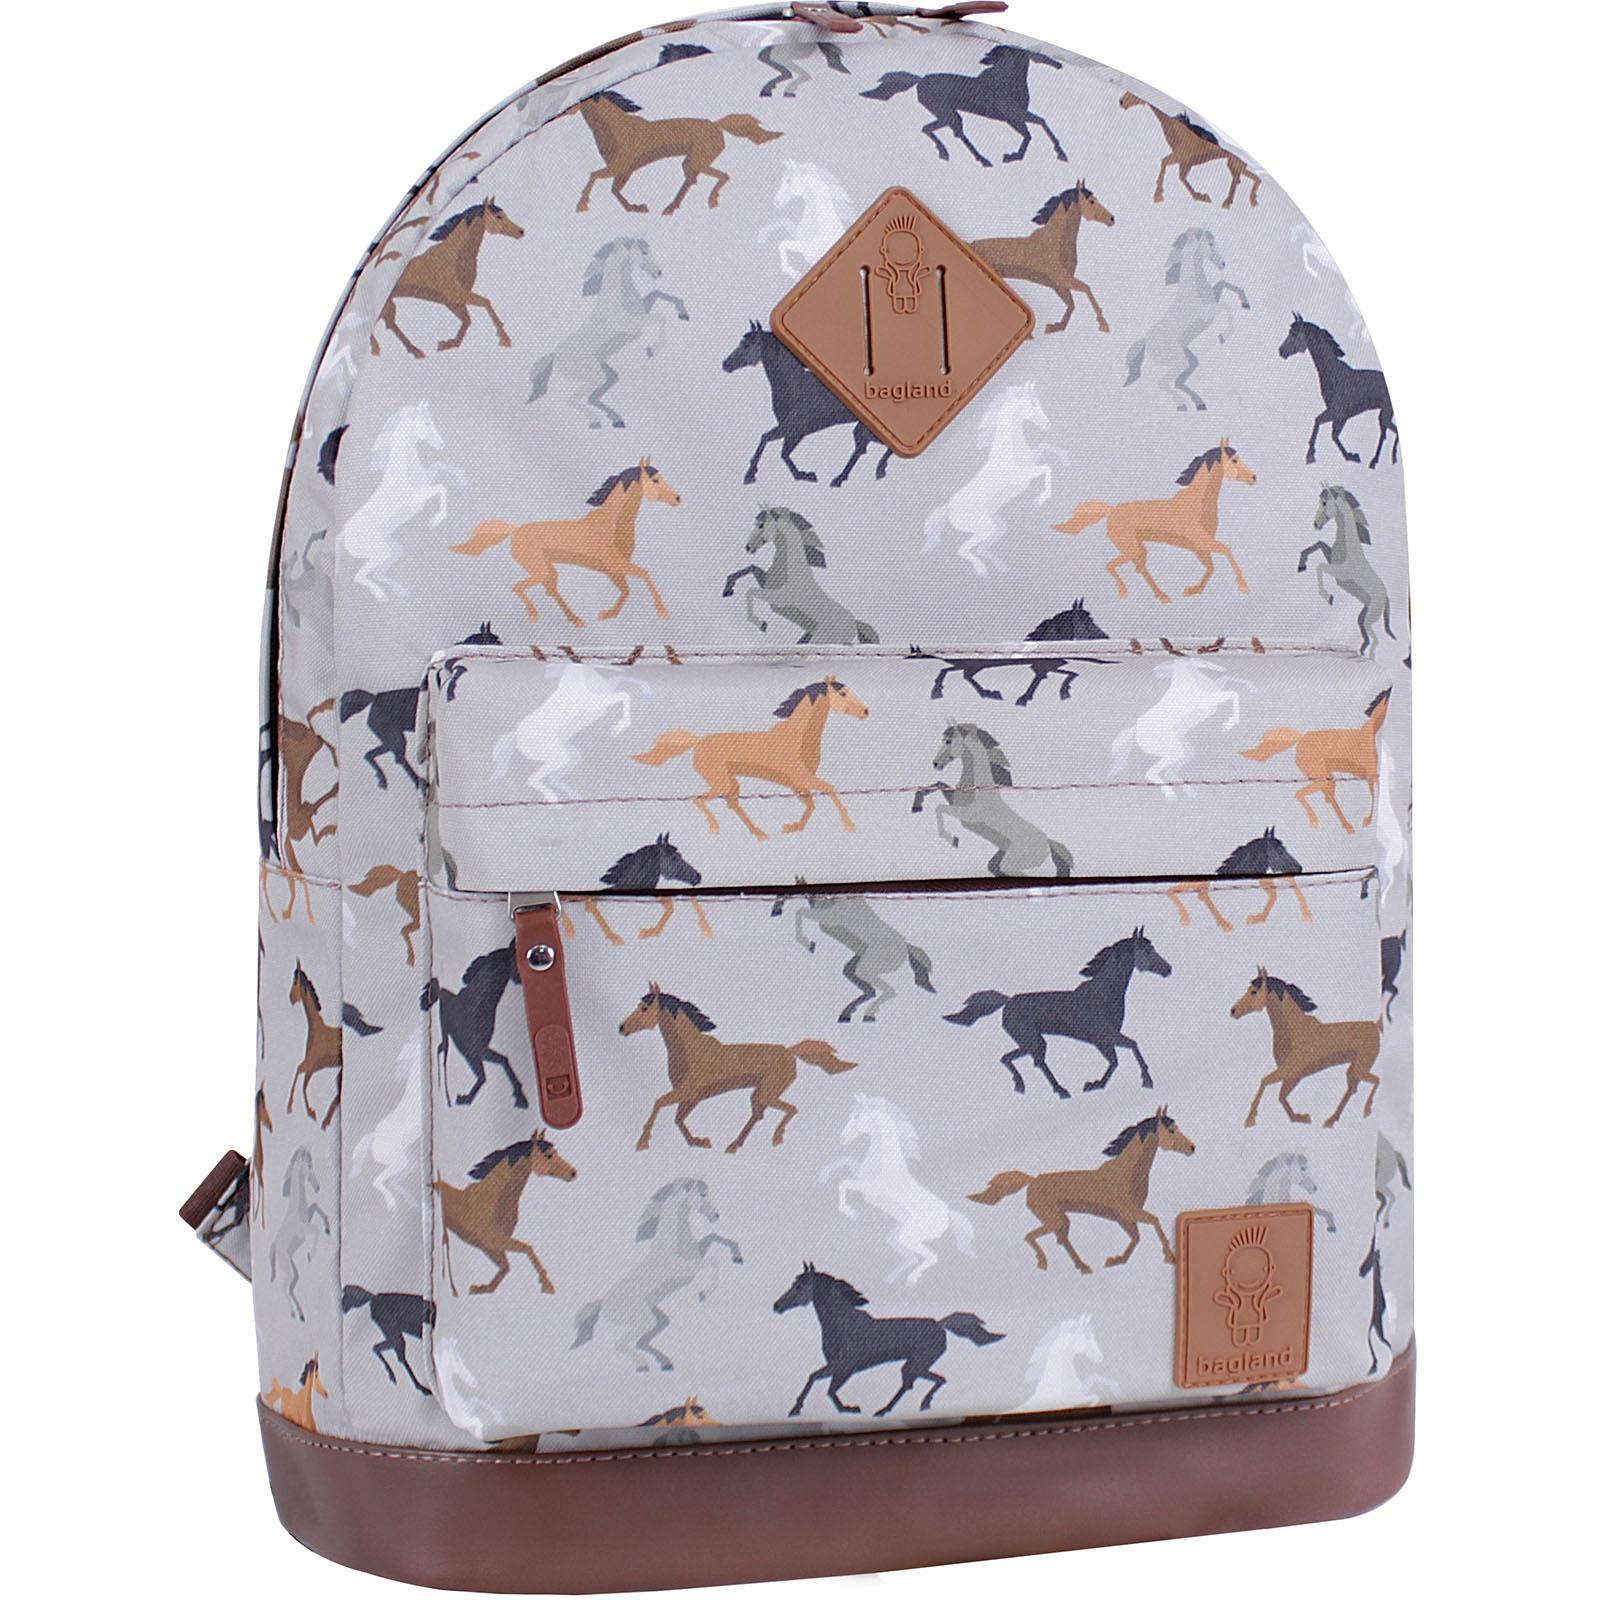 Городские рюкзаки Рюкзак Bagland Молодежный 17 л. сублимация (лошади) (005336640) IMG_4439_суб.85_.JPG